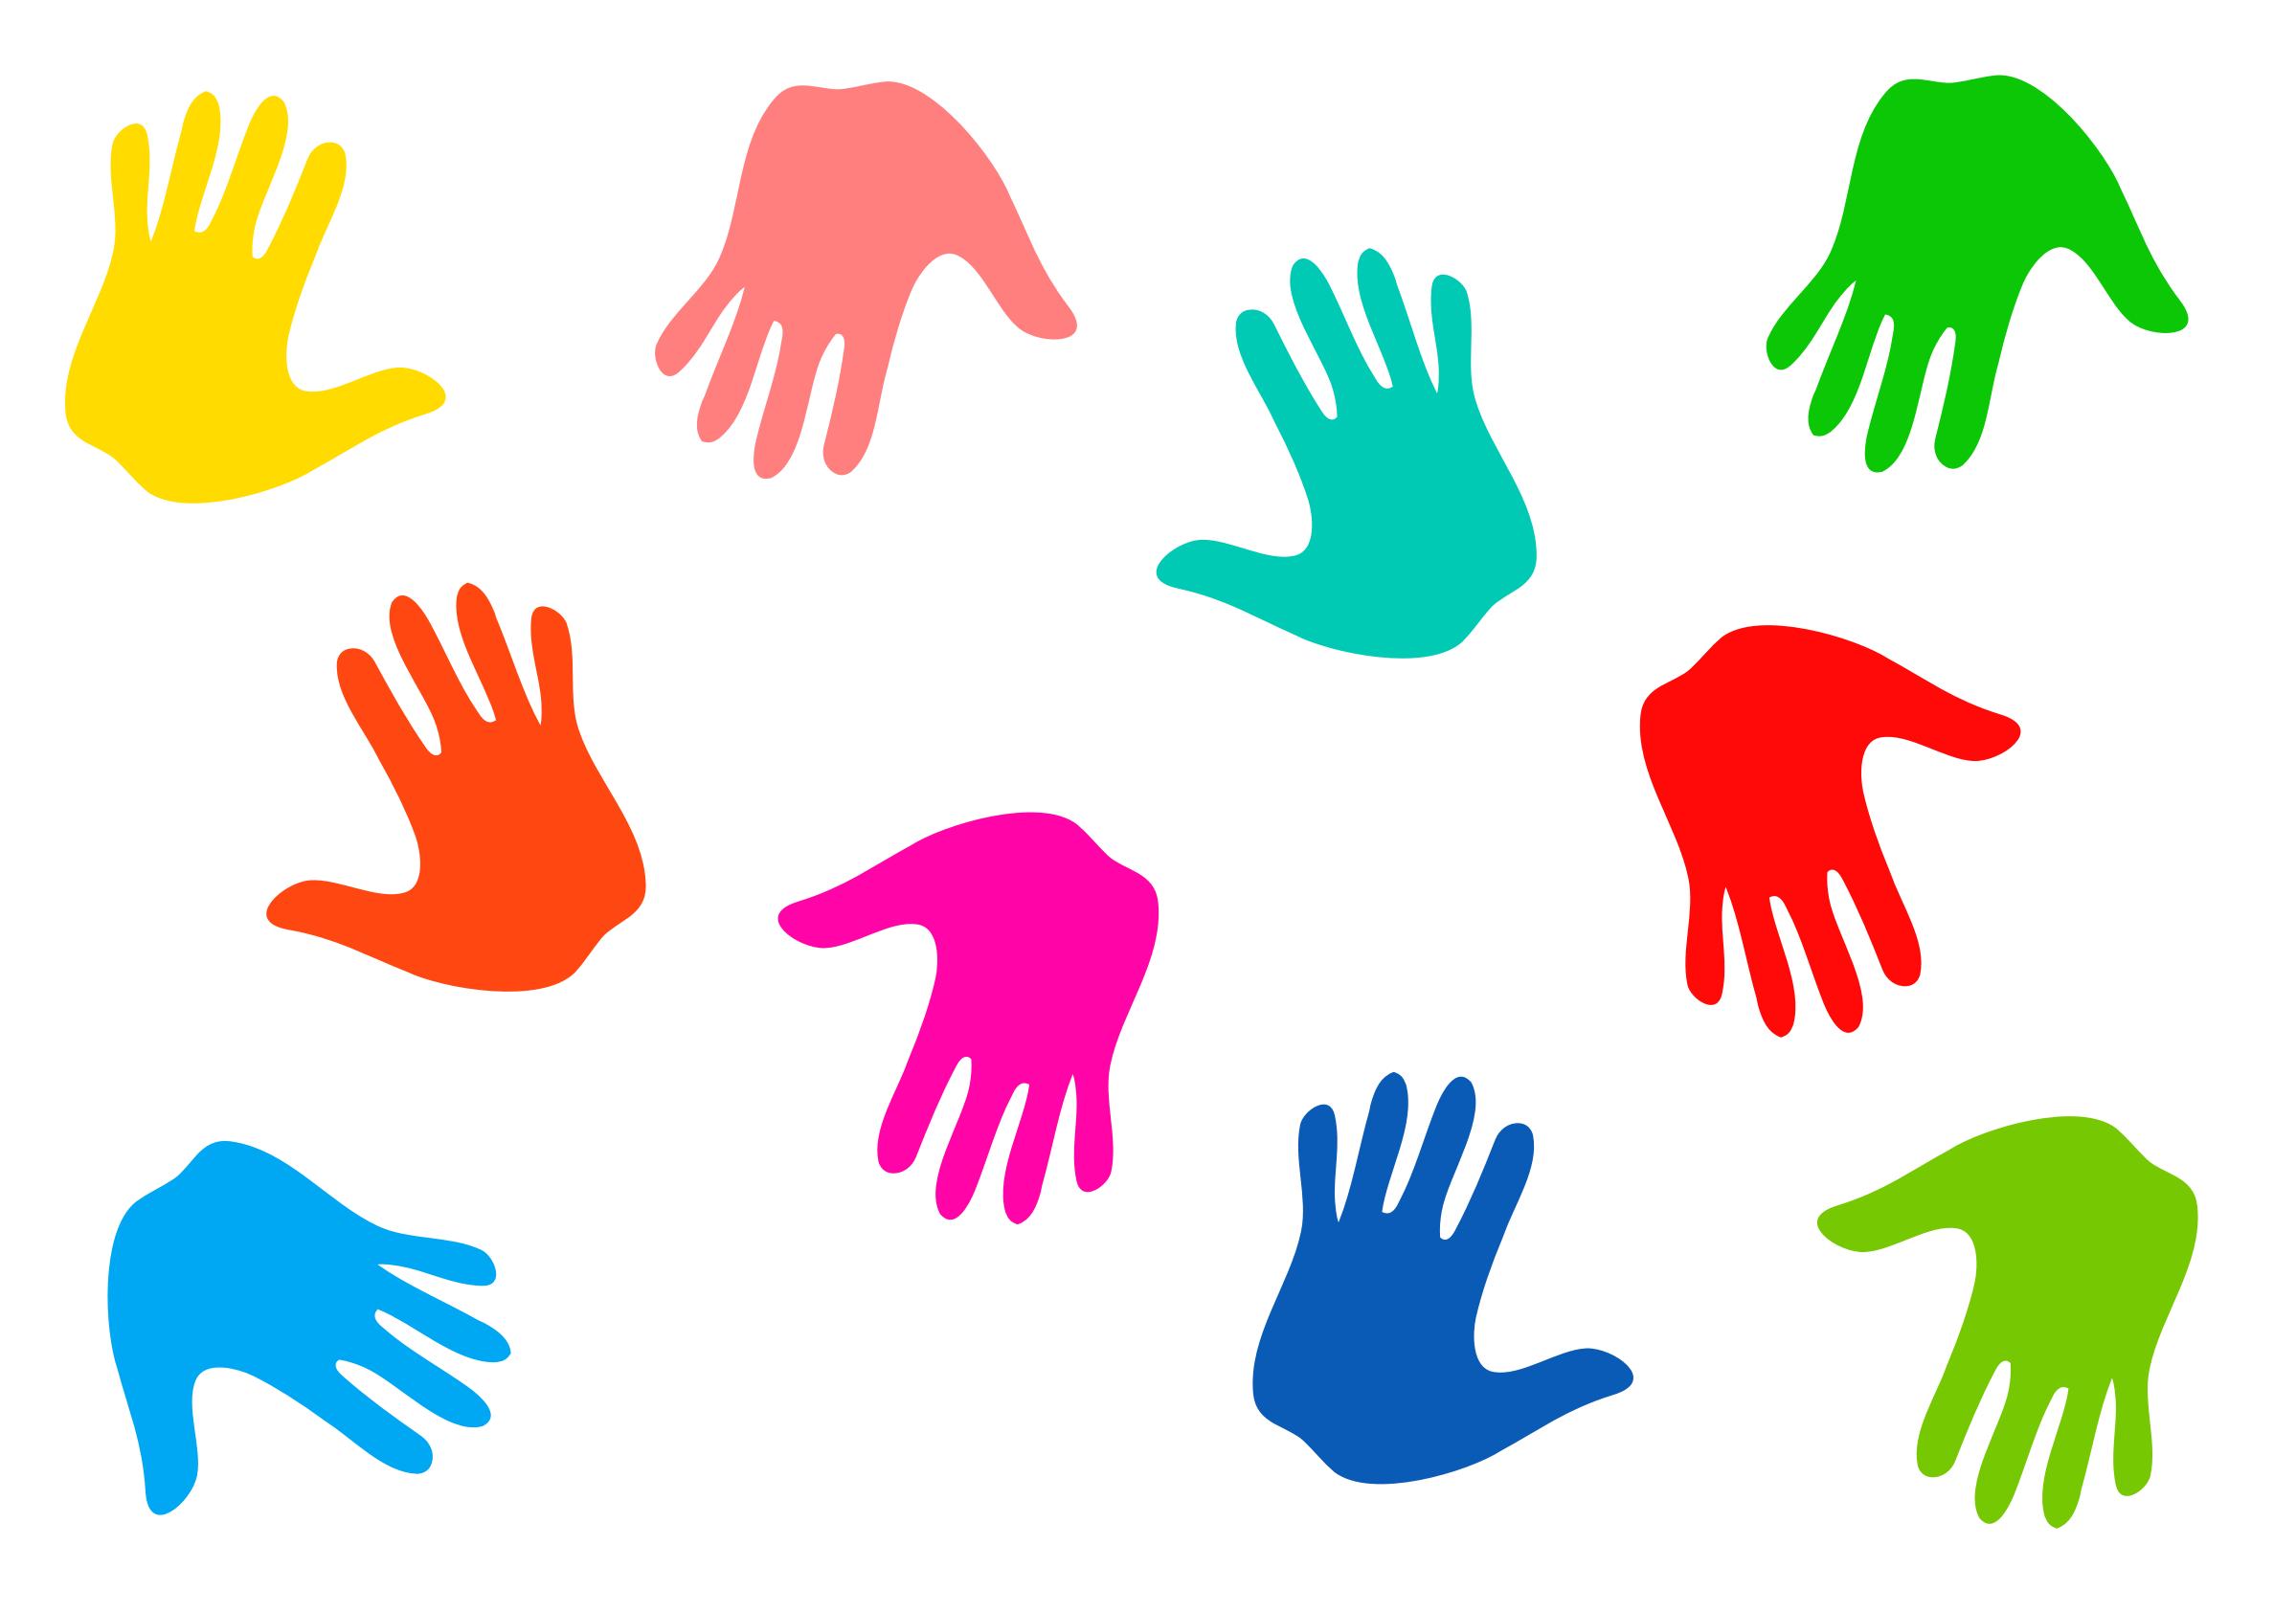 Clipart - Hand Prints